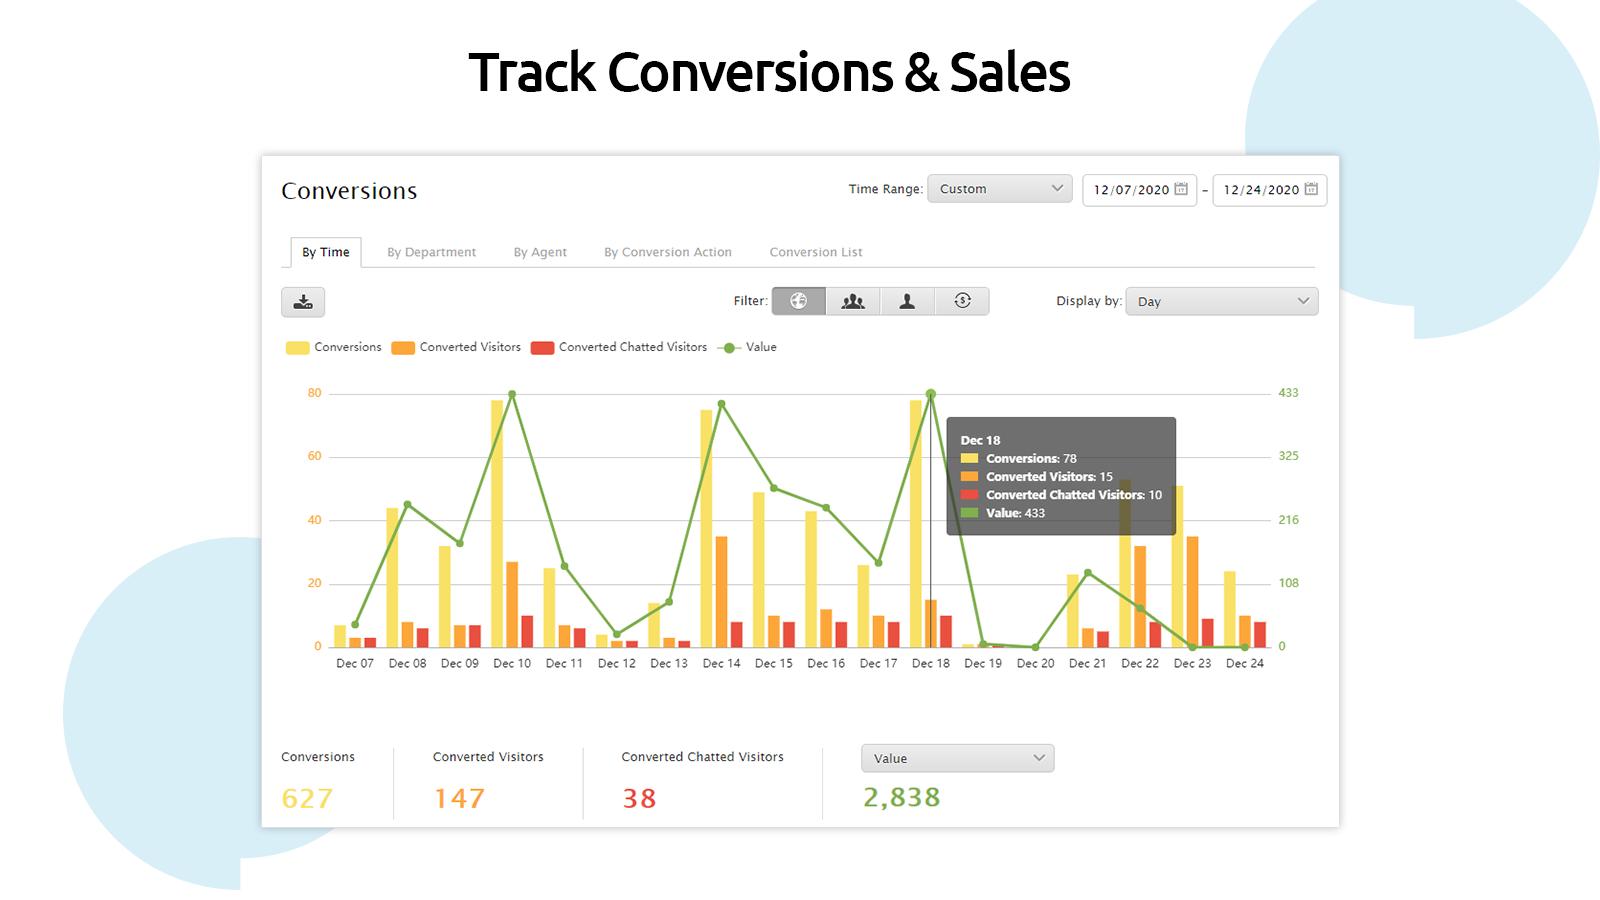 Track Conversions & Sales